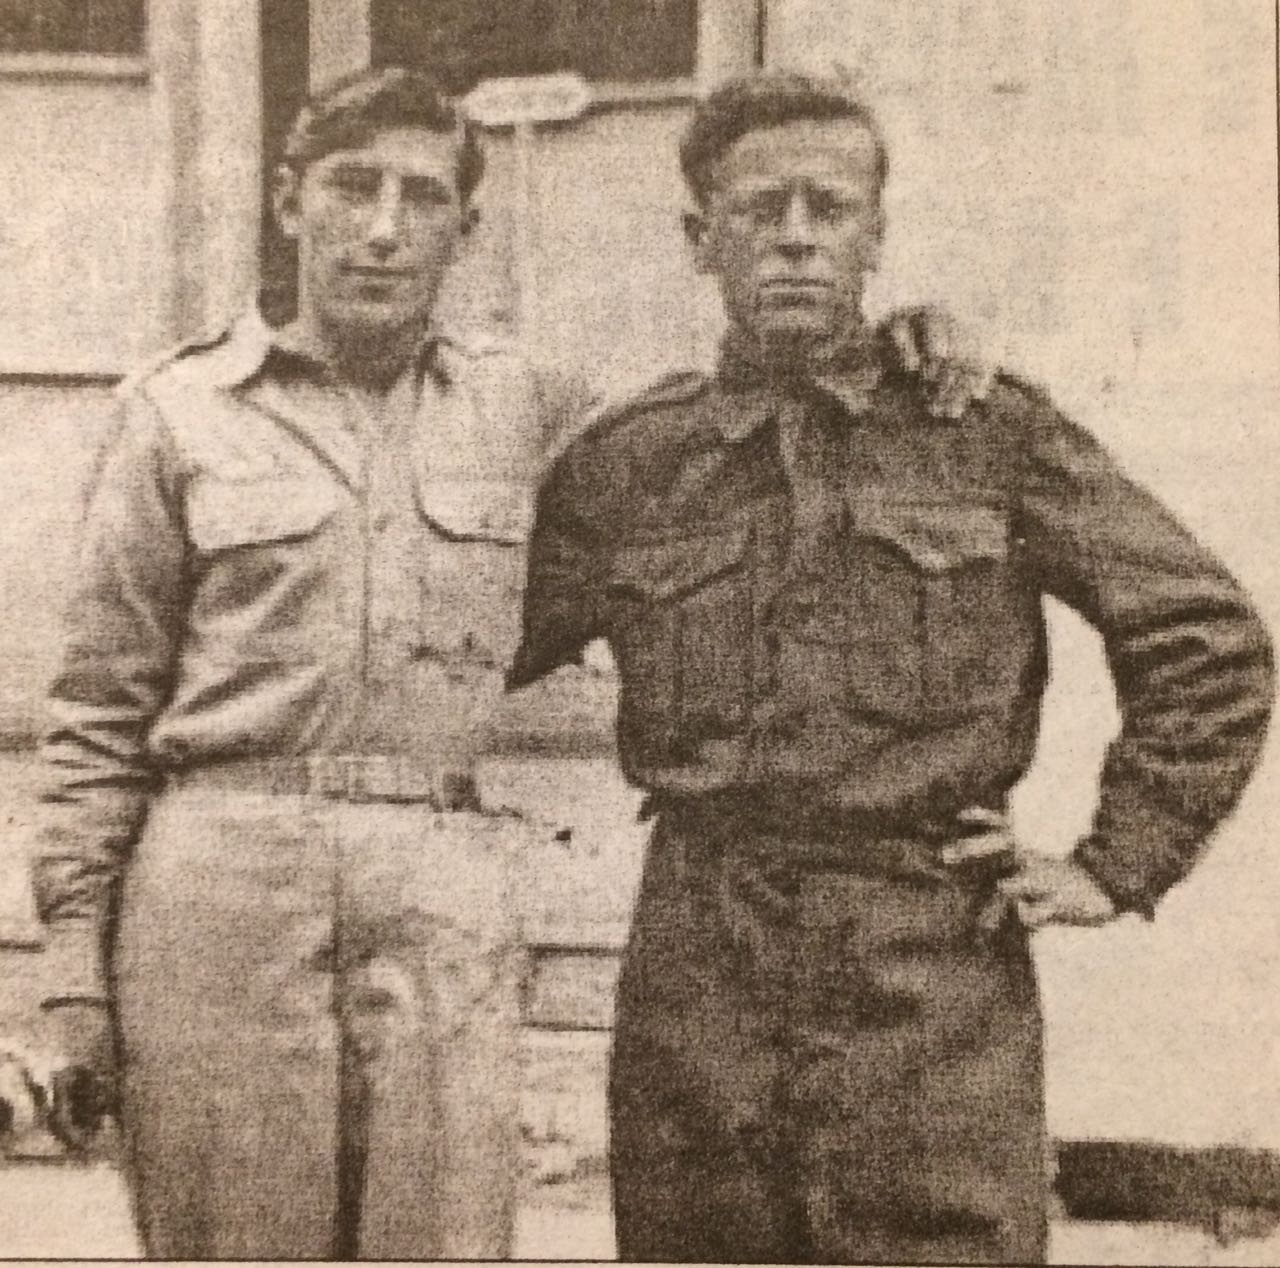 Halim Merolli dhe Remzi Barolli në Qipro (1954). I pari përdorte pseudonimin Kristo Popaqi, kurse i dyti, Remziu, Jani Beqari